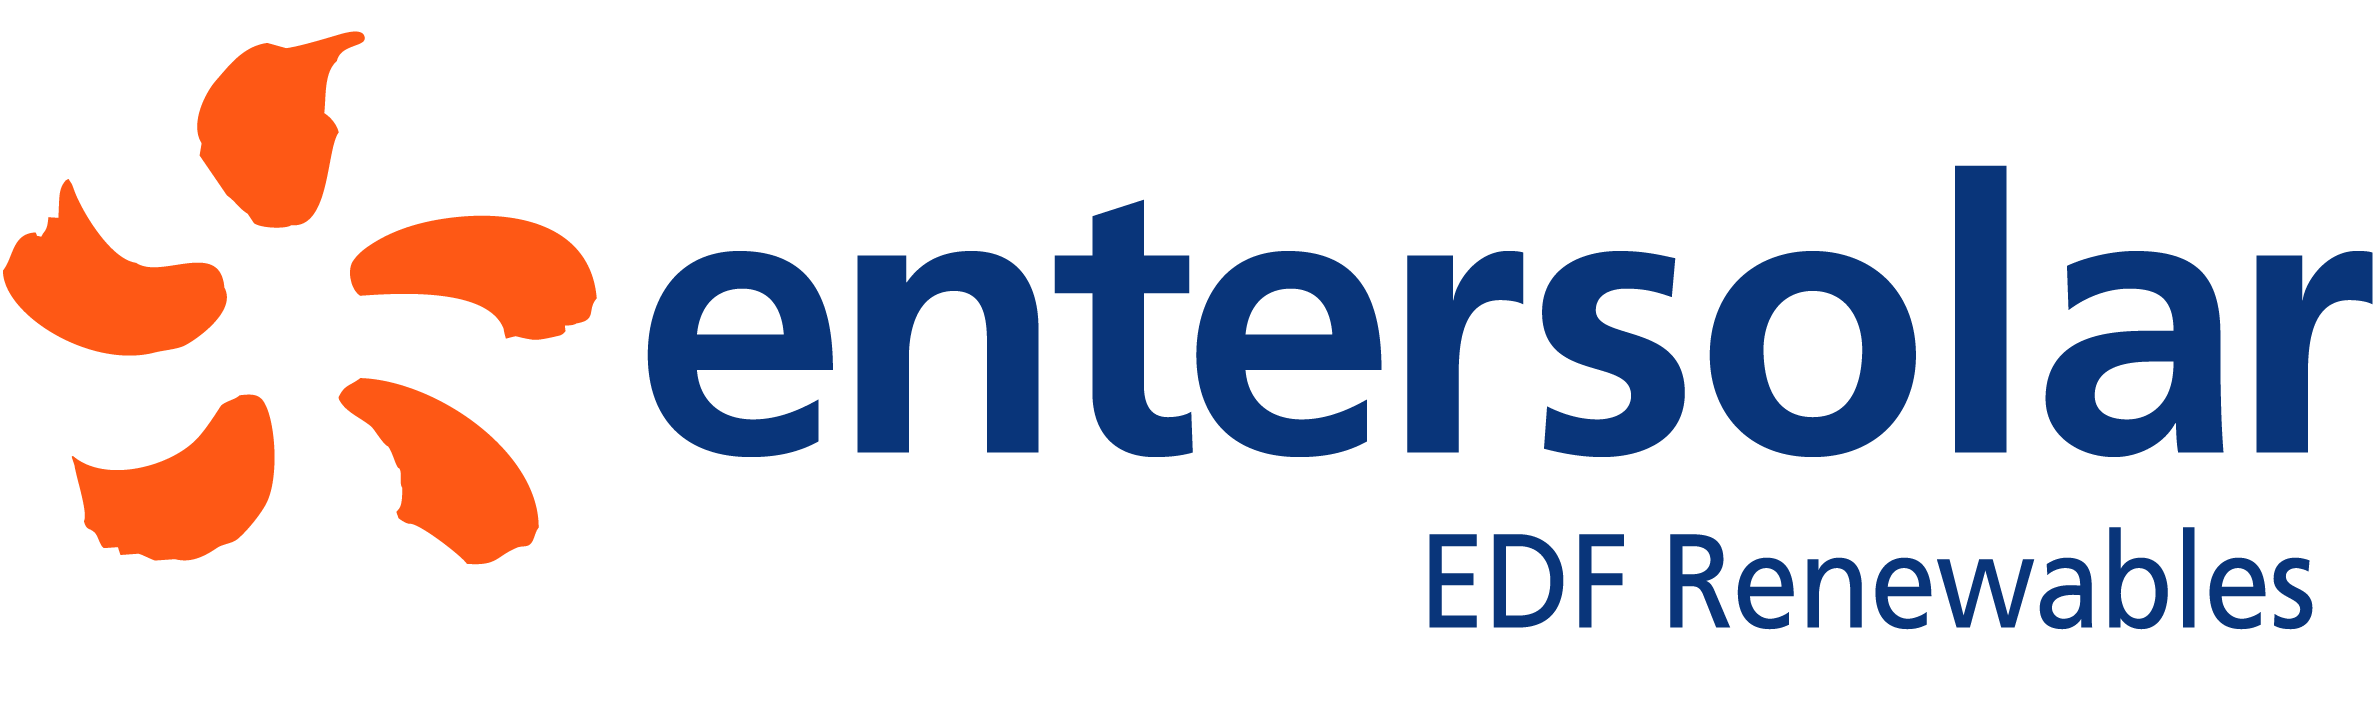 EnterSolar